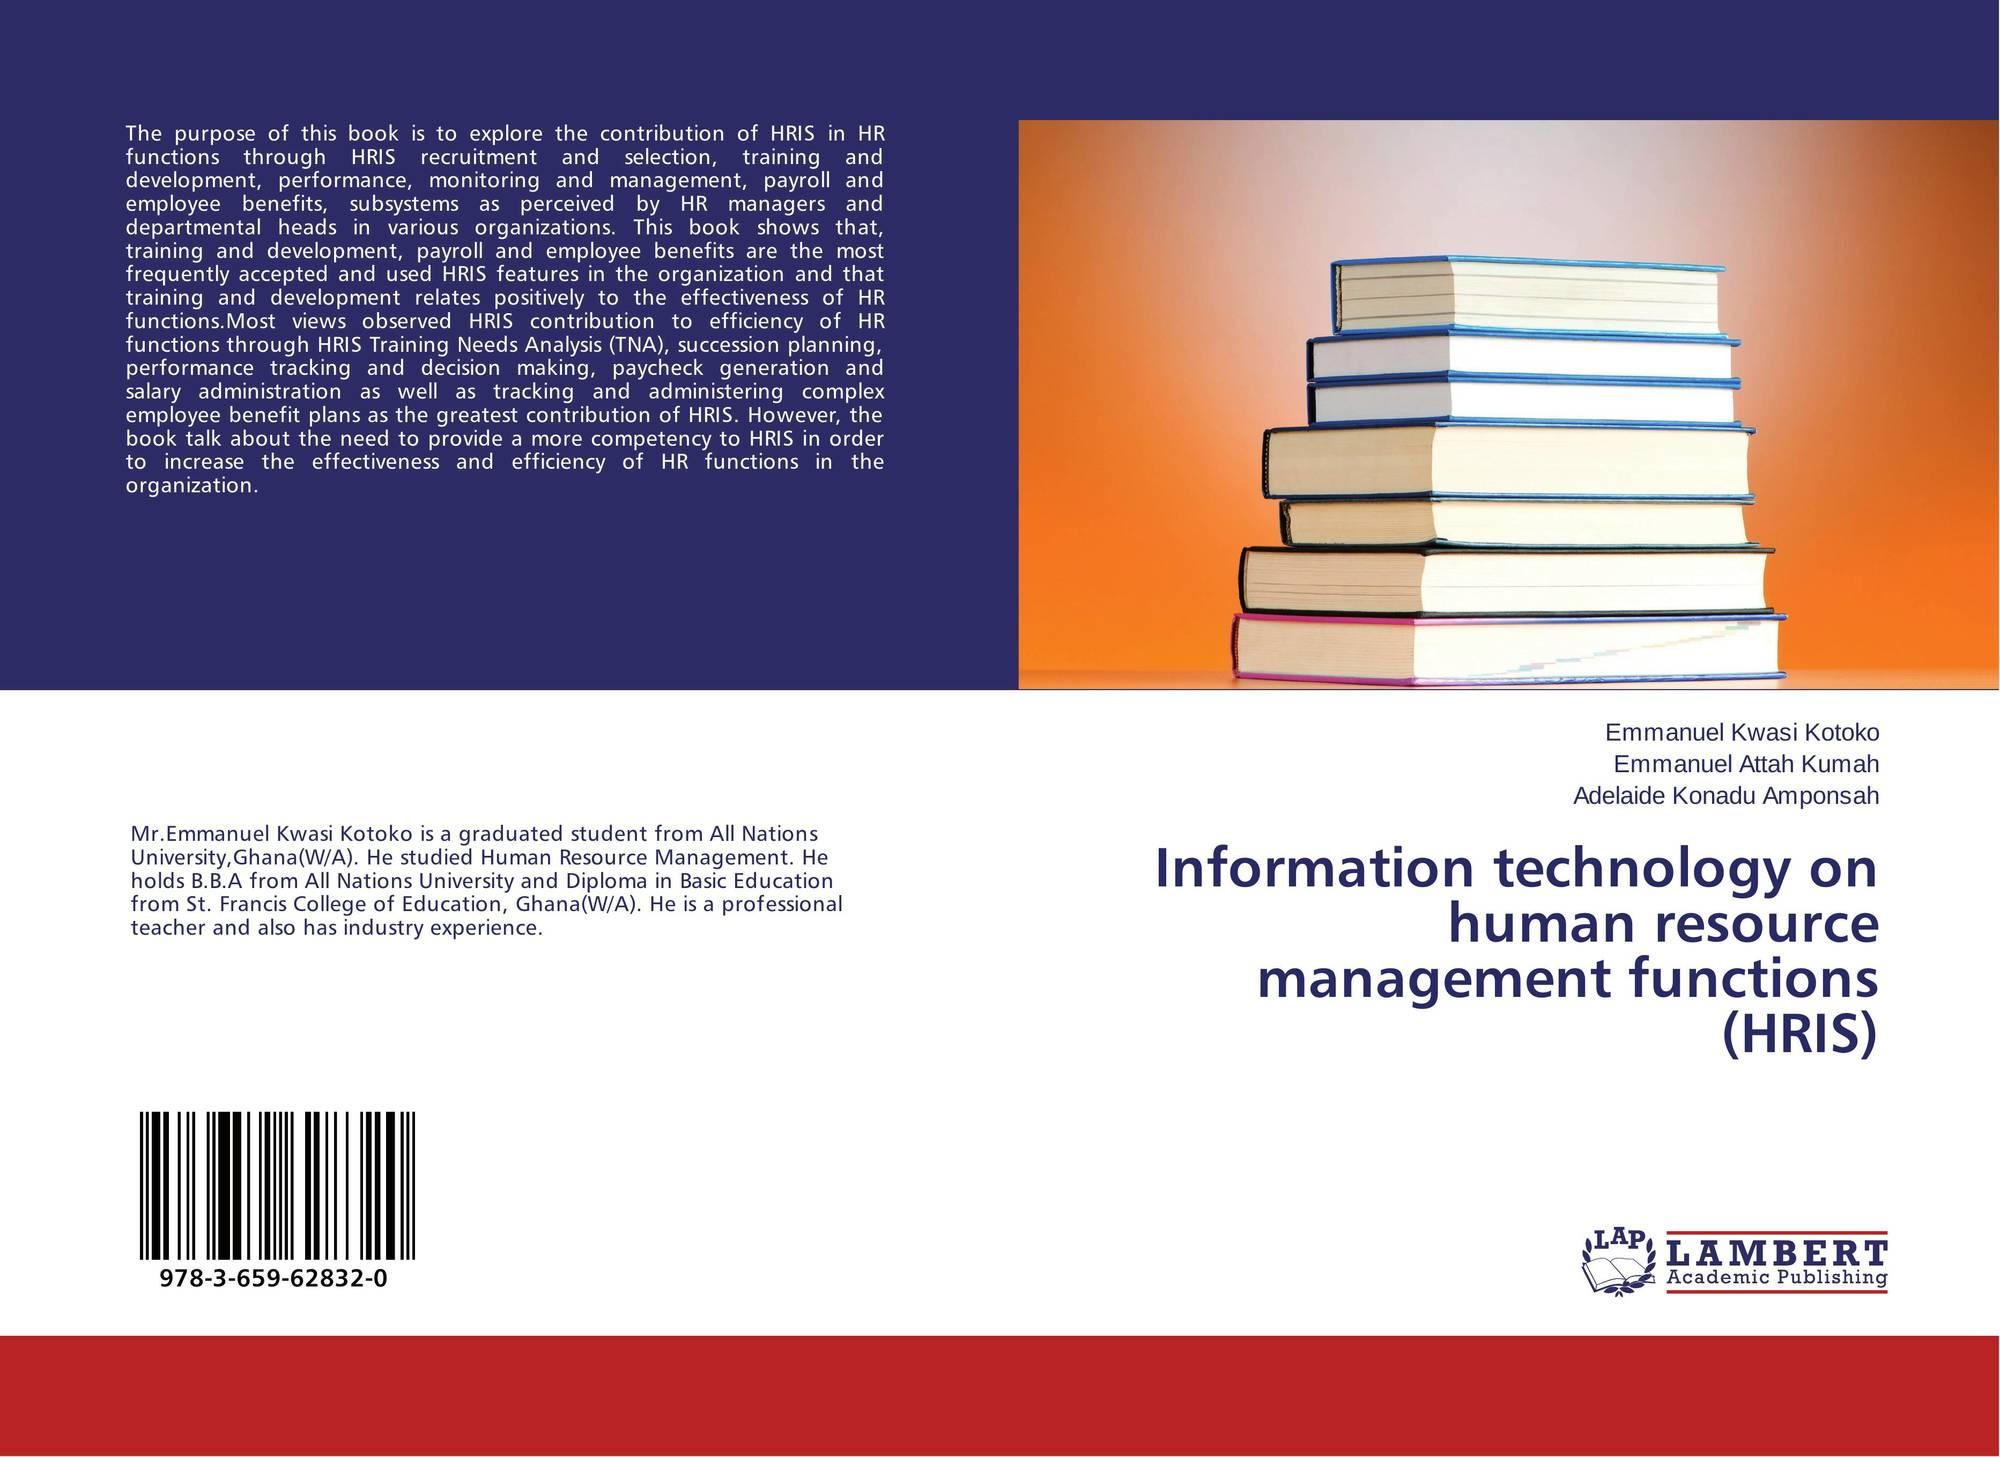 Technology Management Image: Information Technology On Human Resource Management